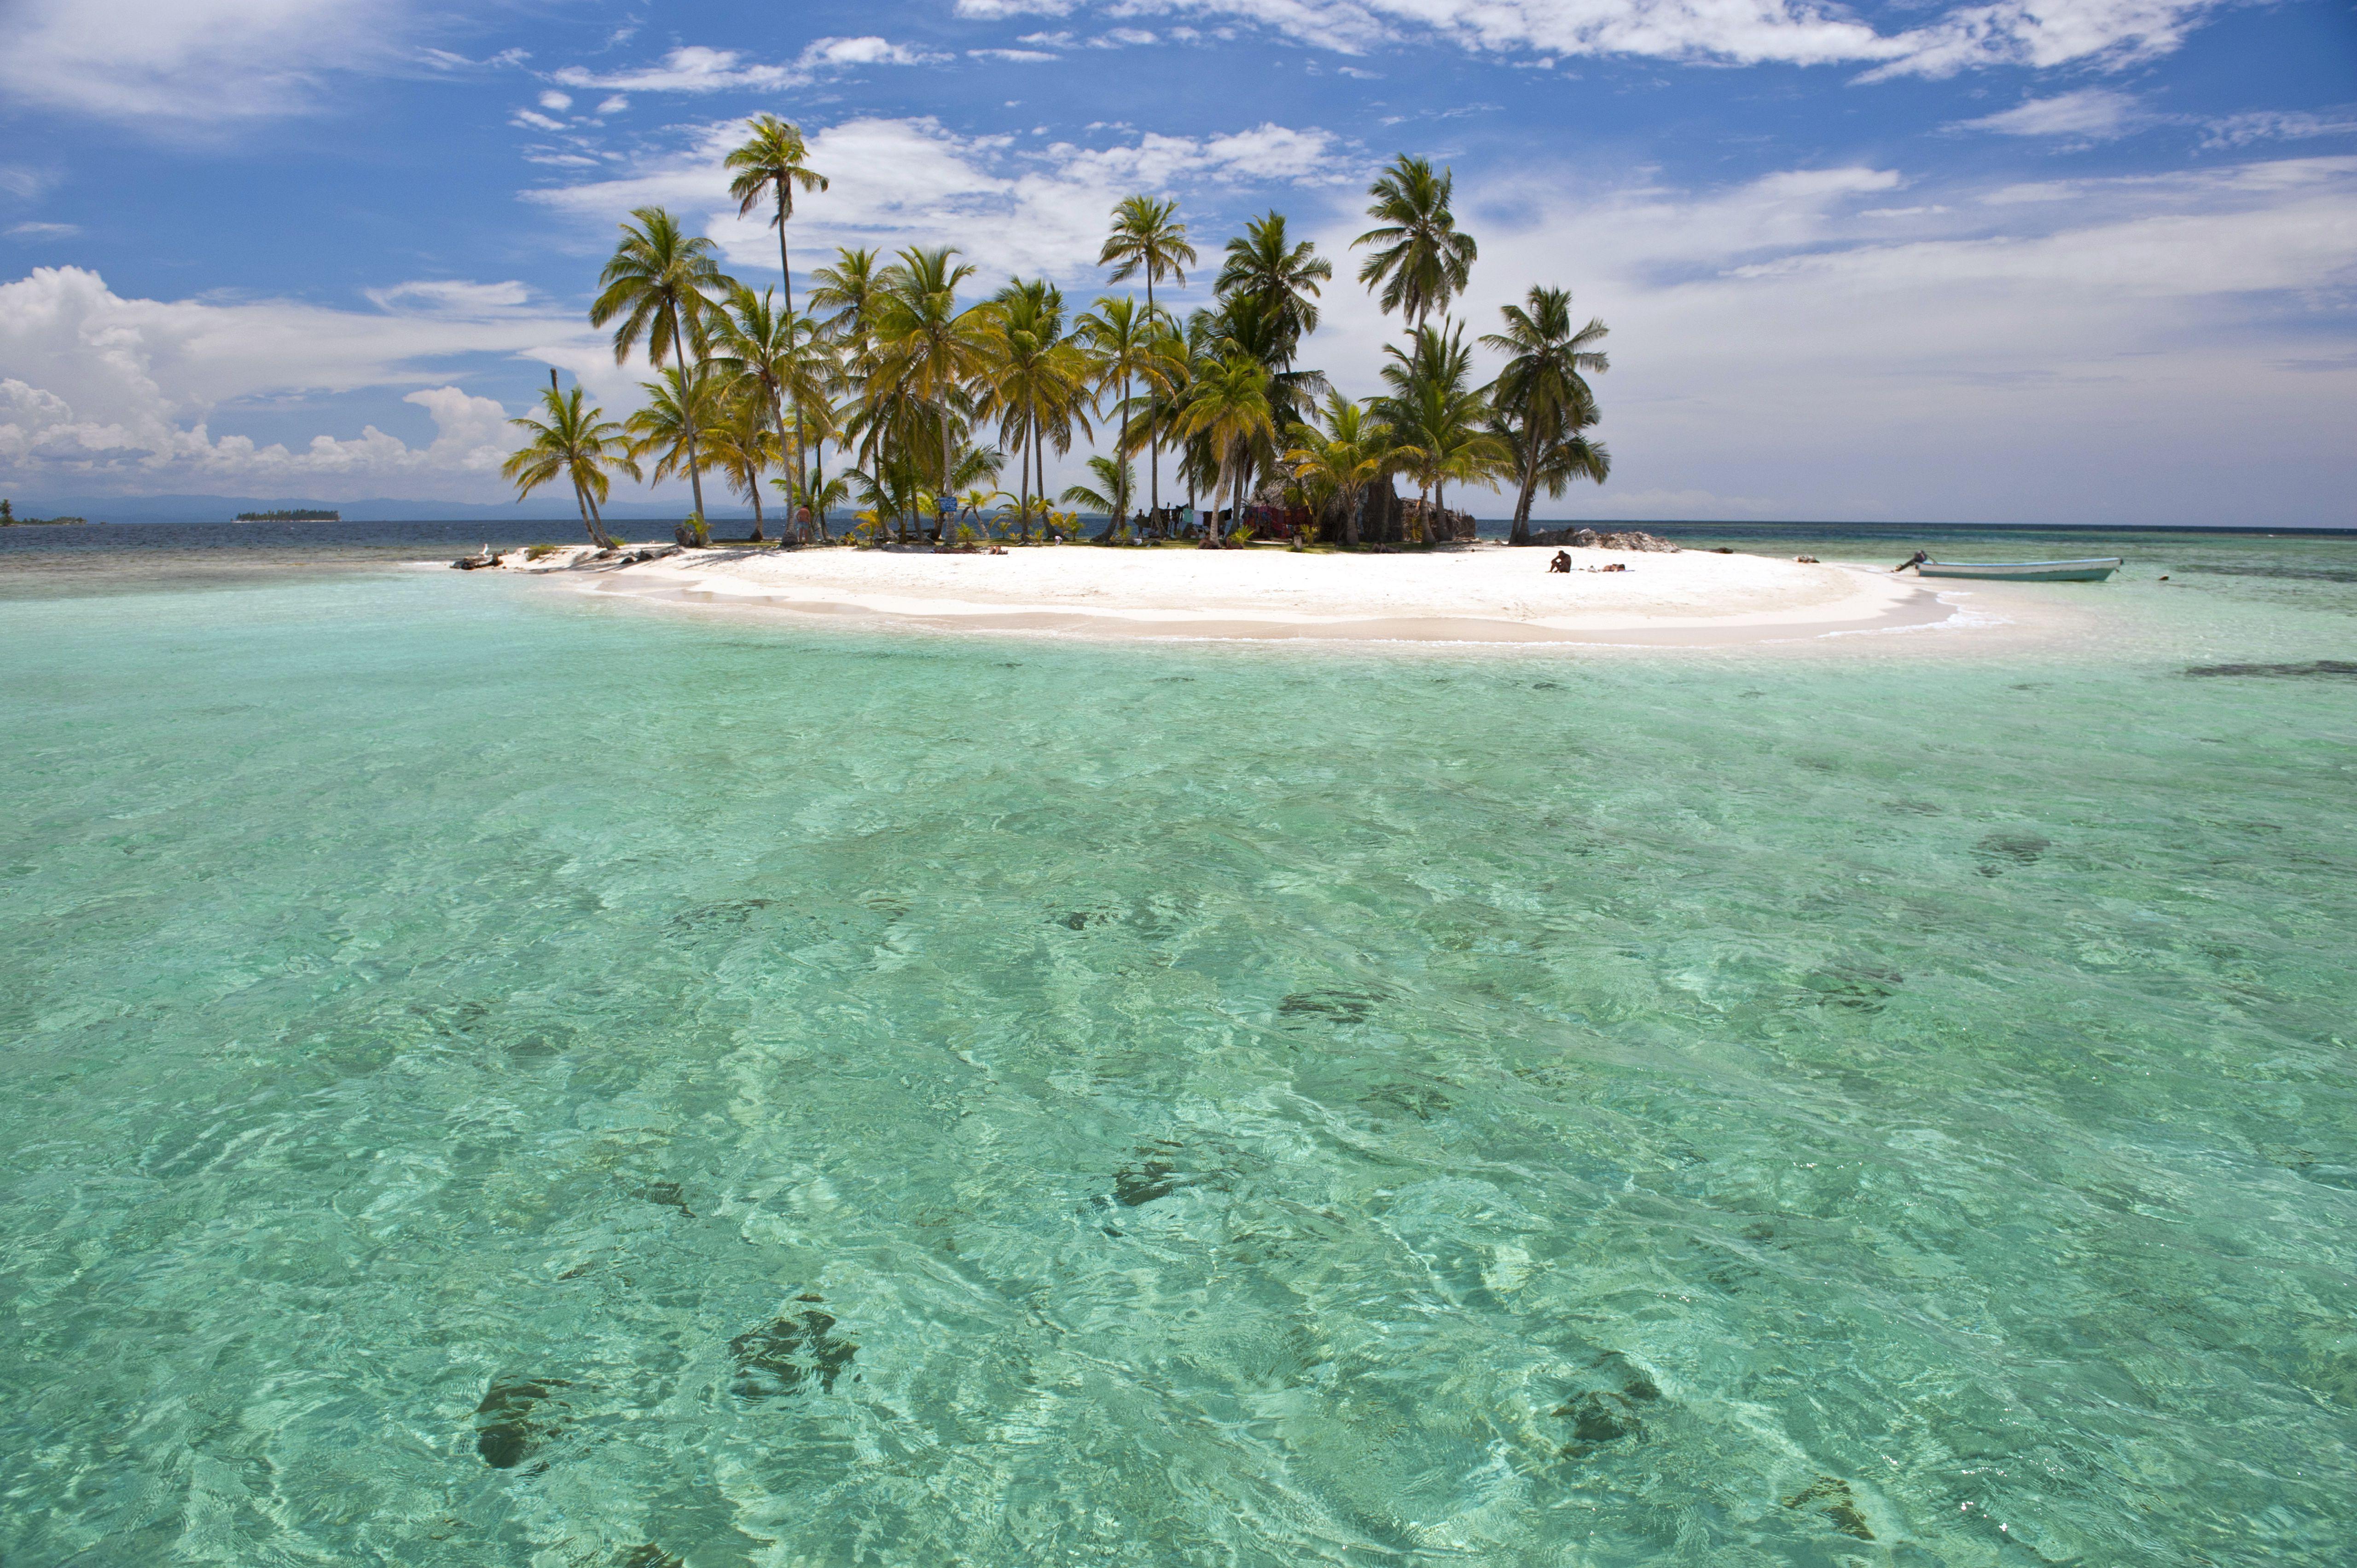 Panama, San Blas archipelago, Kuna Yala autonomous territory, Los Pelicanos island, one of 378 islands